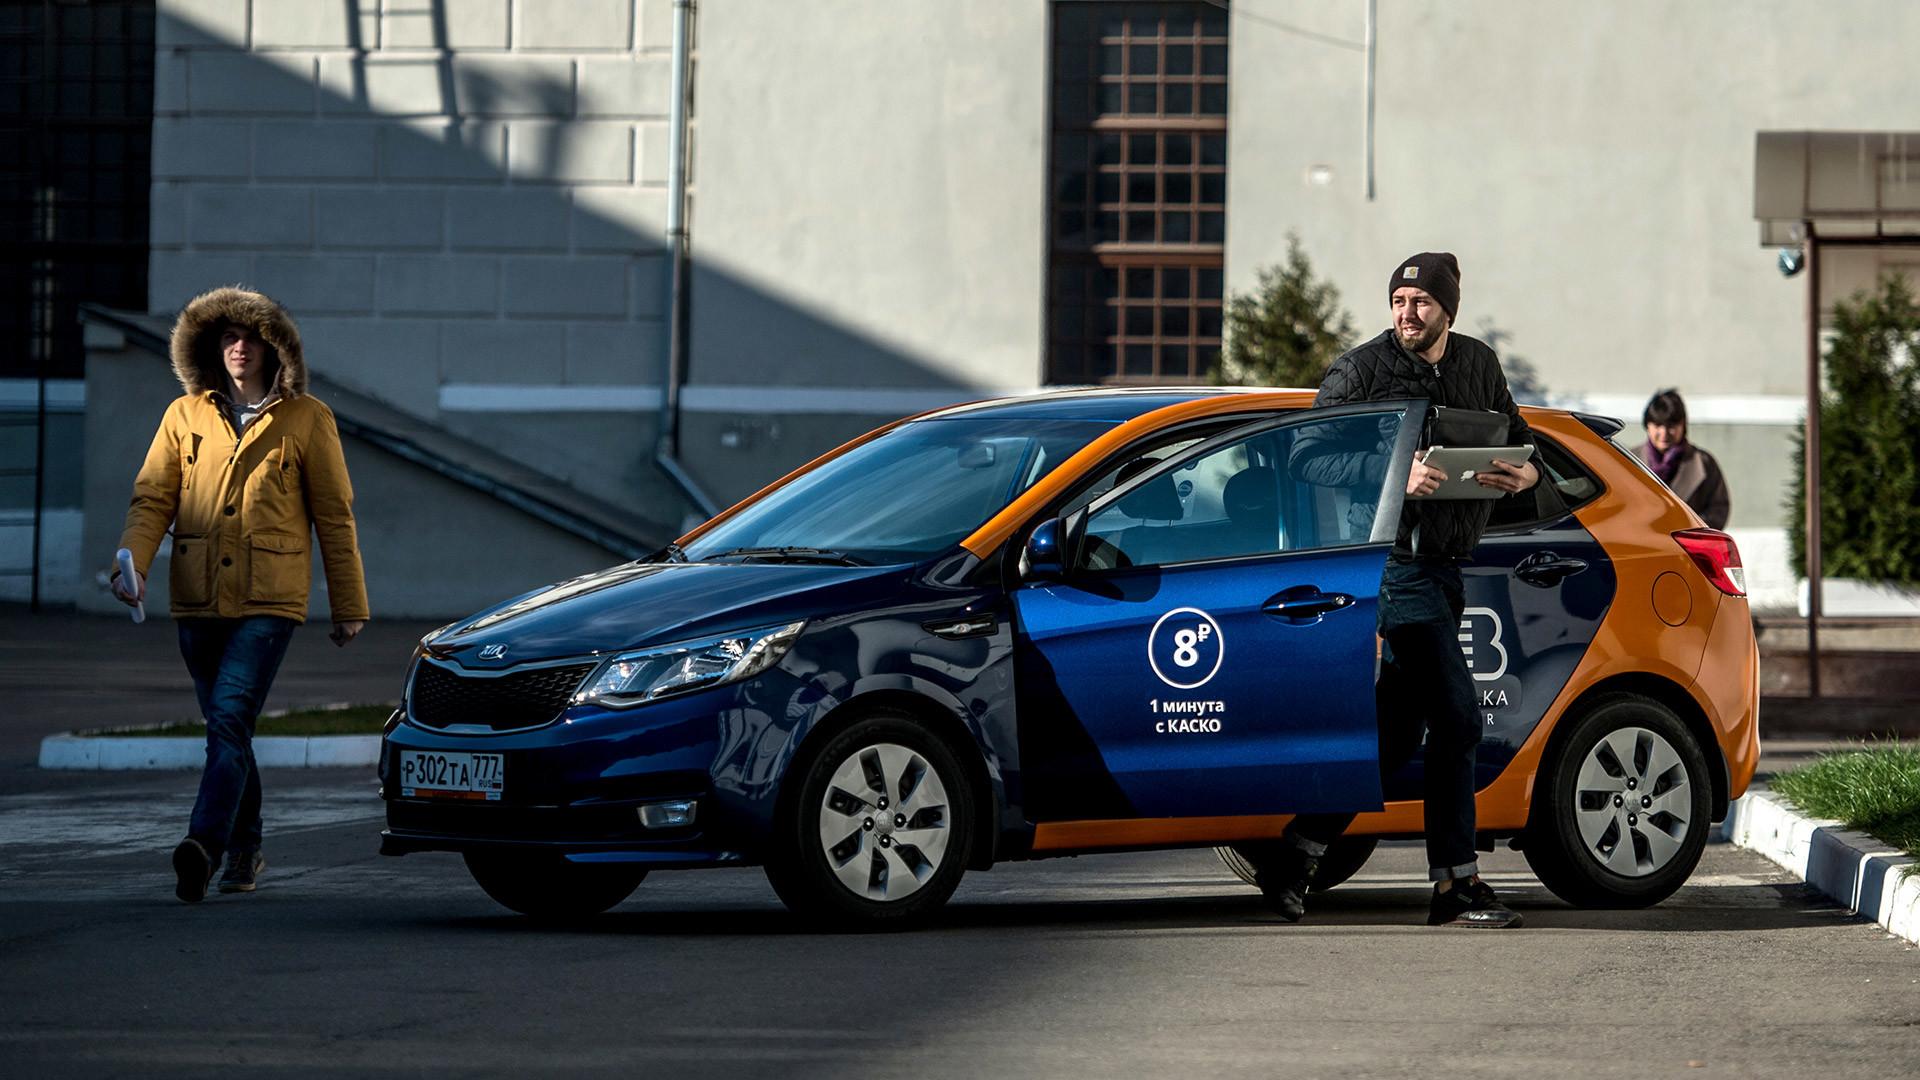 Das Carsharing-Unternehmen BelkaCar